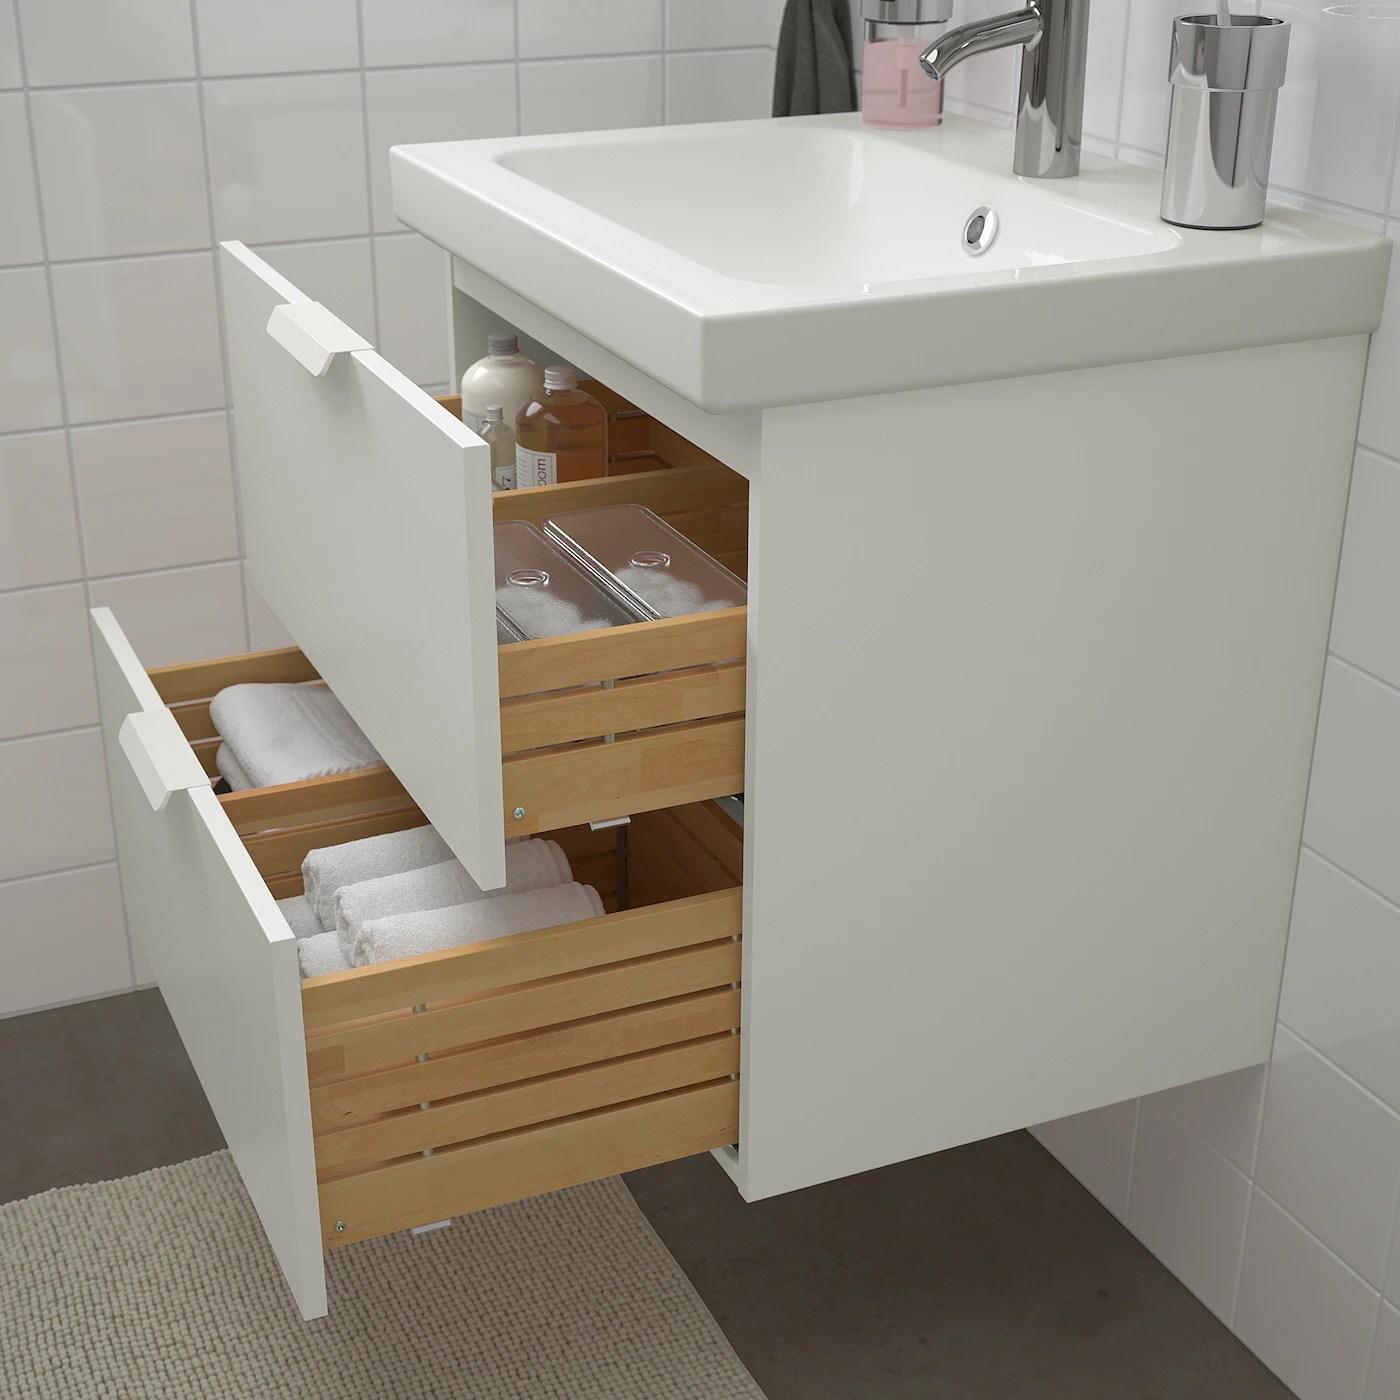 godmorgon odensvik mobilier salle de bain 4 pieces blanc dalskar mitigeur lavabo 63 cm